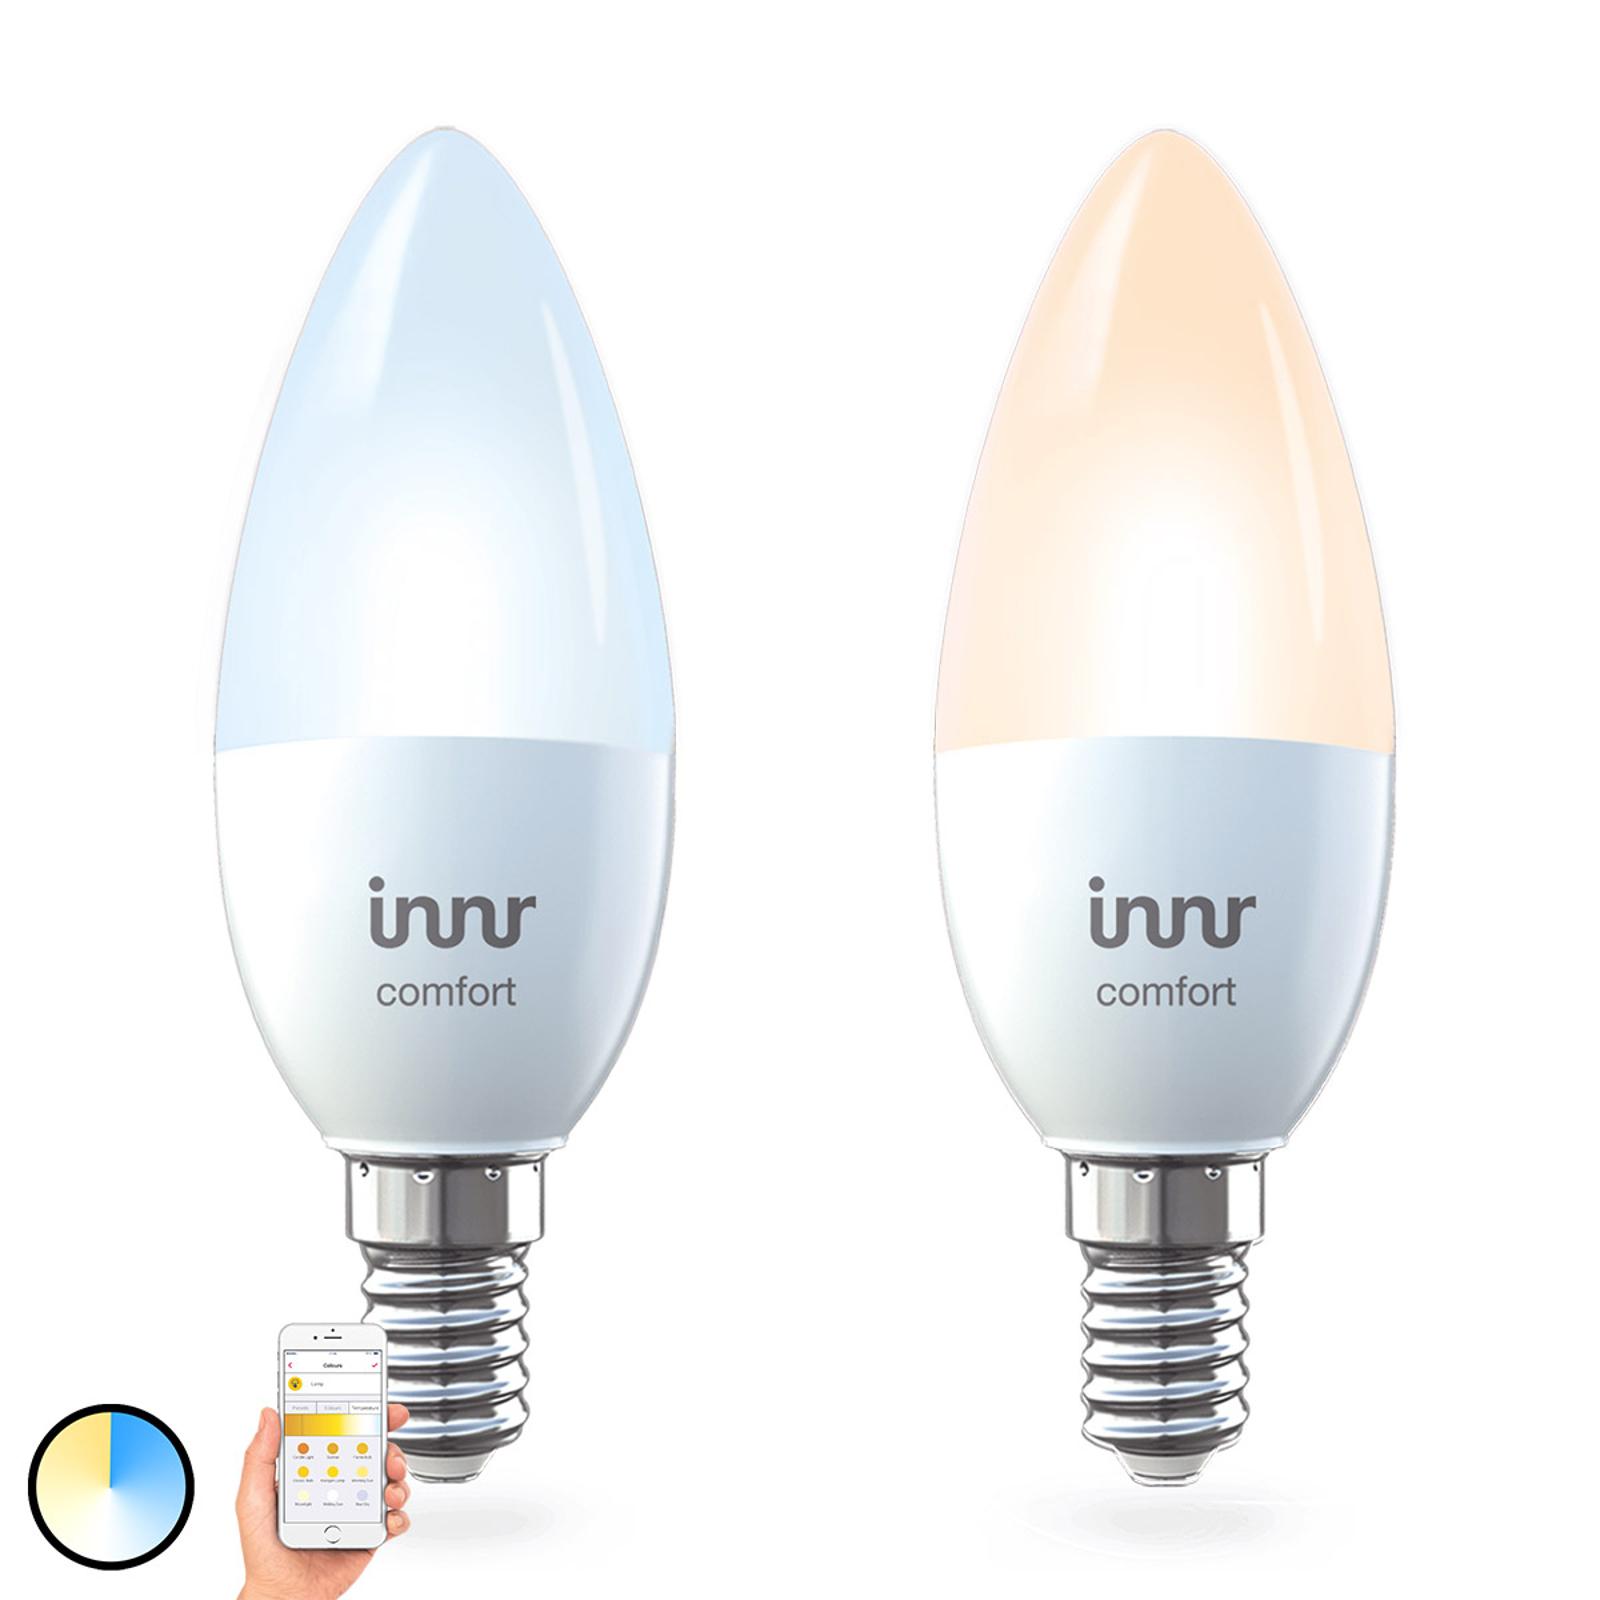 E14 5,8 W żarówka LED Innr Smart Candle Comfort